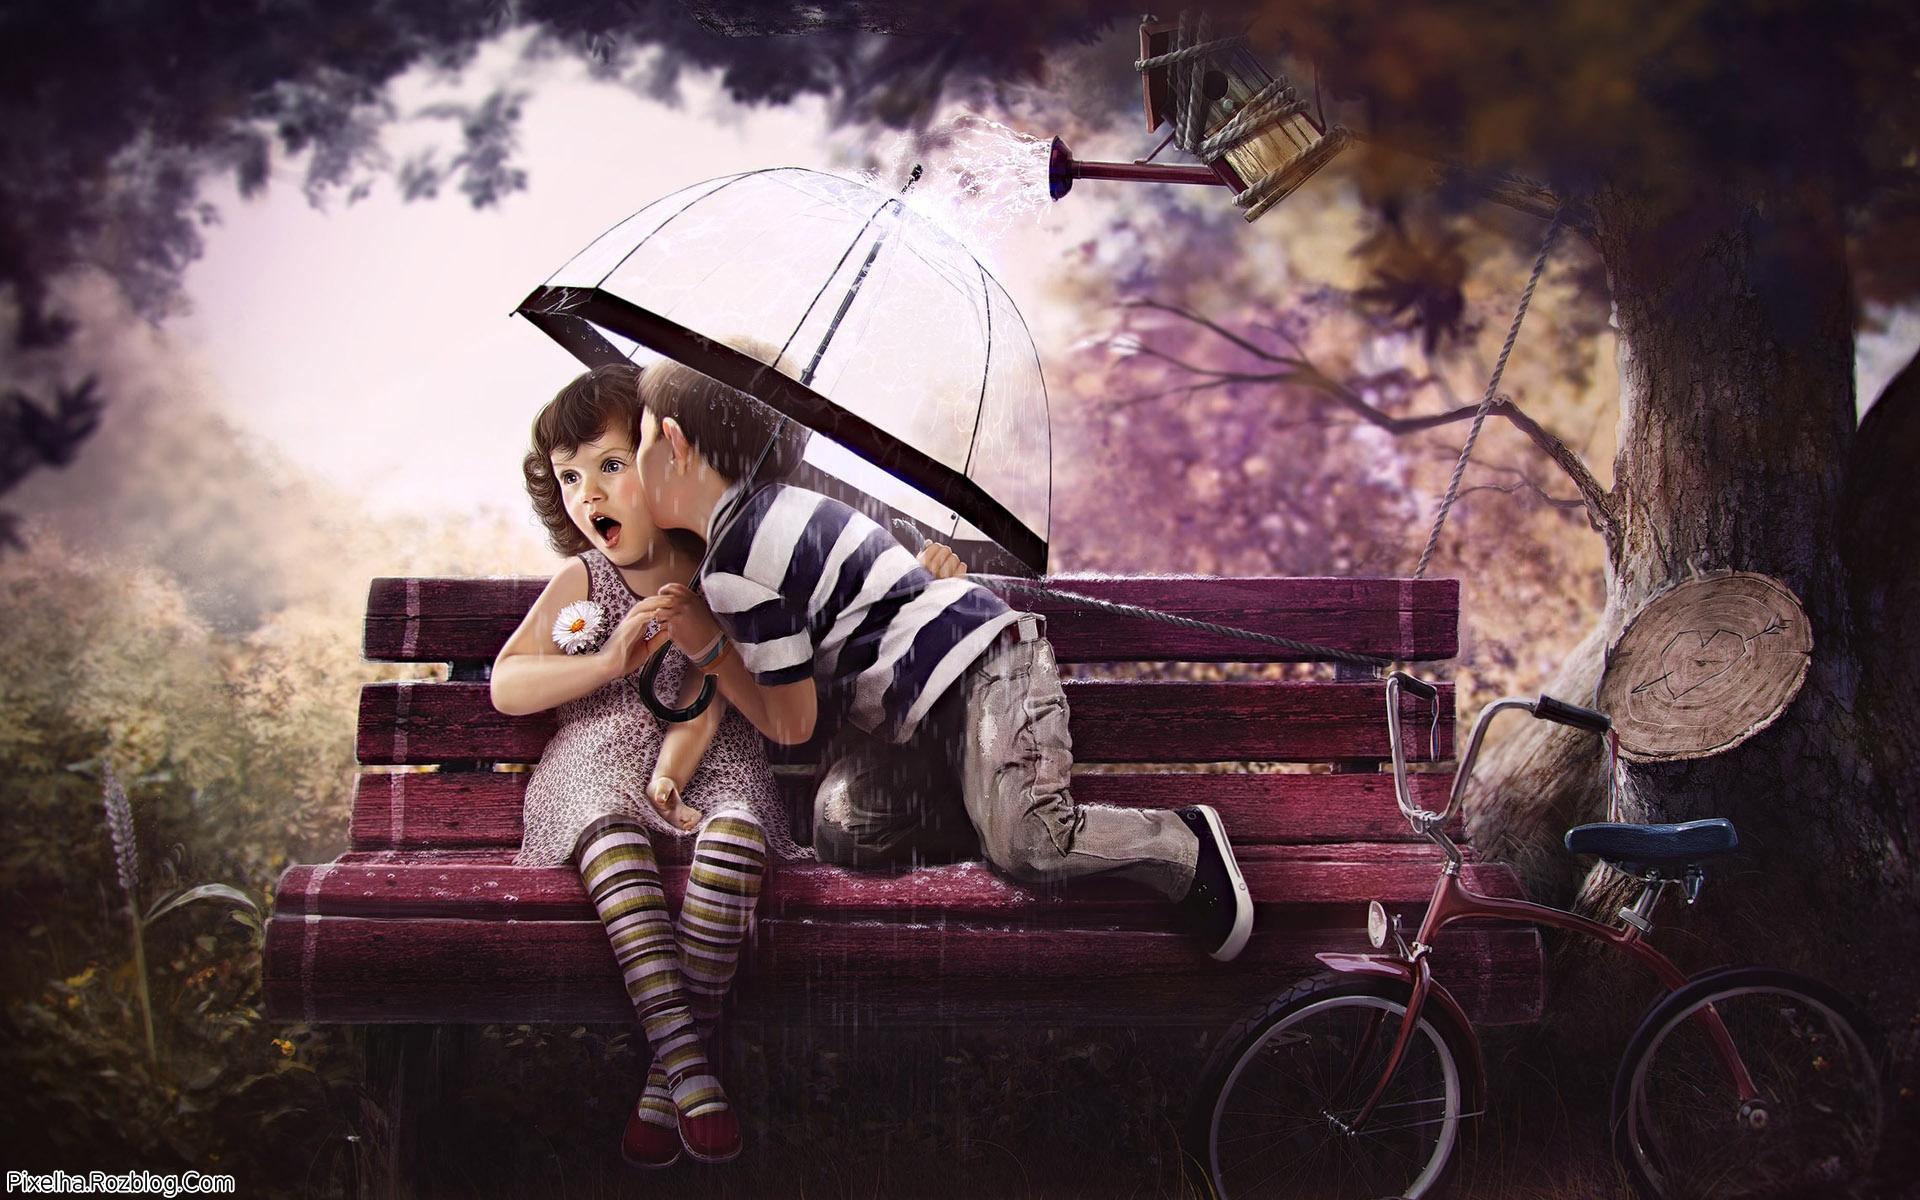 عکس کارتونی بوسه دختربچه و پسربچه